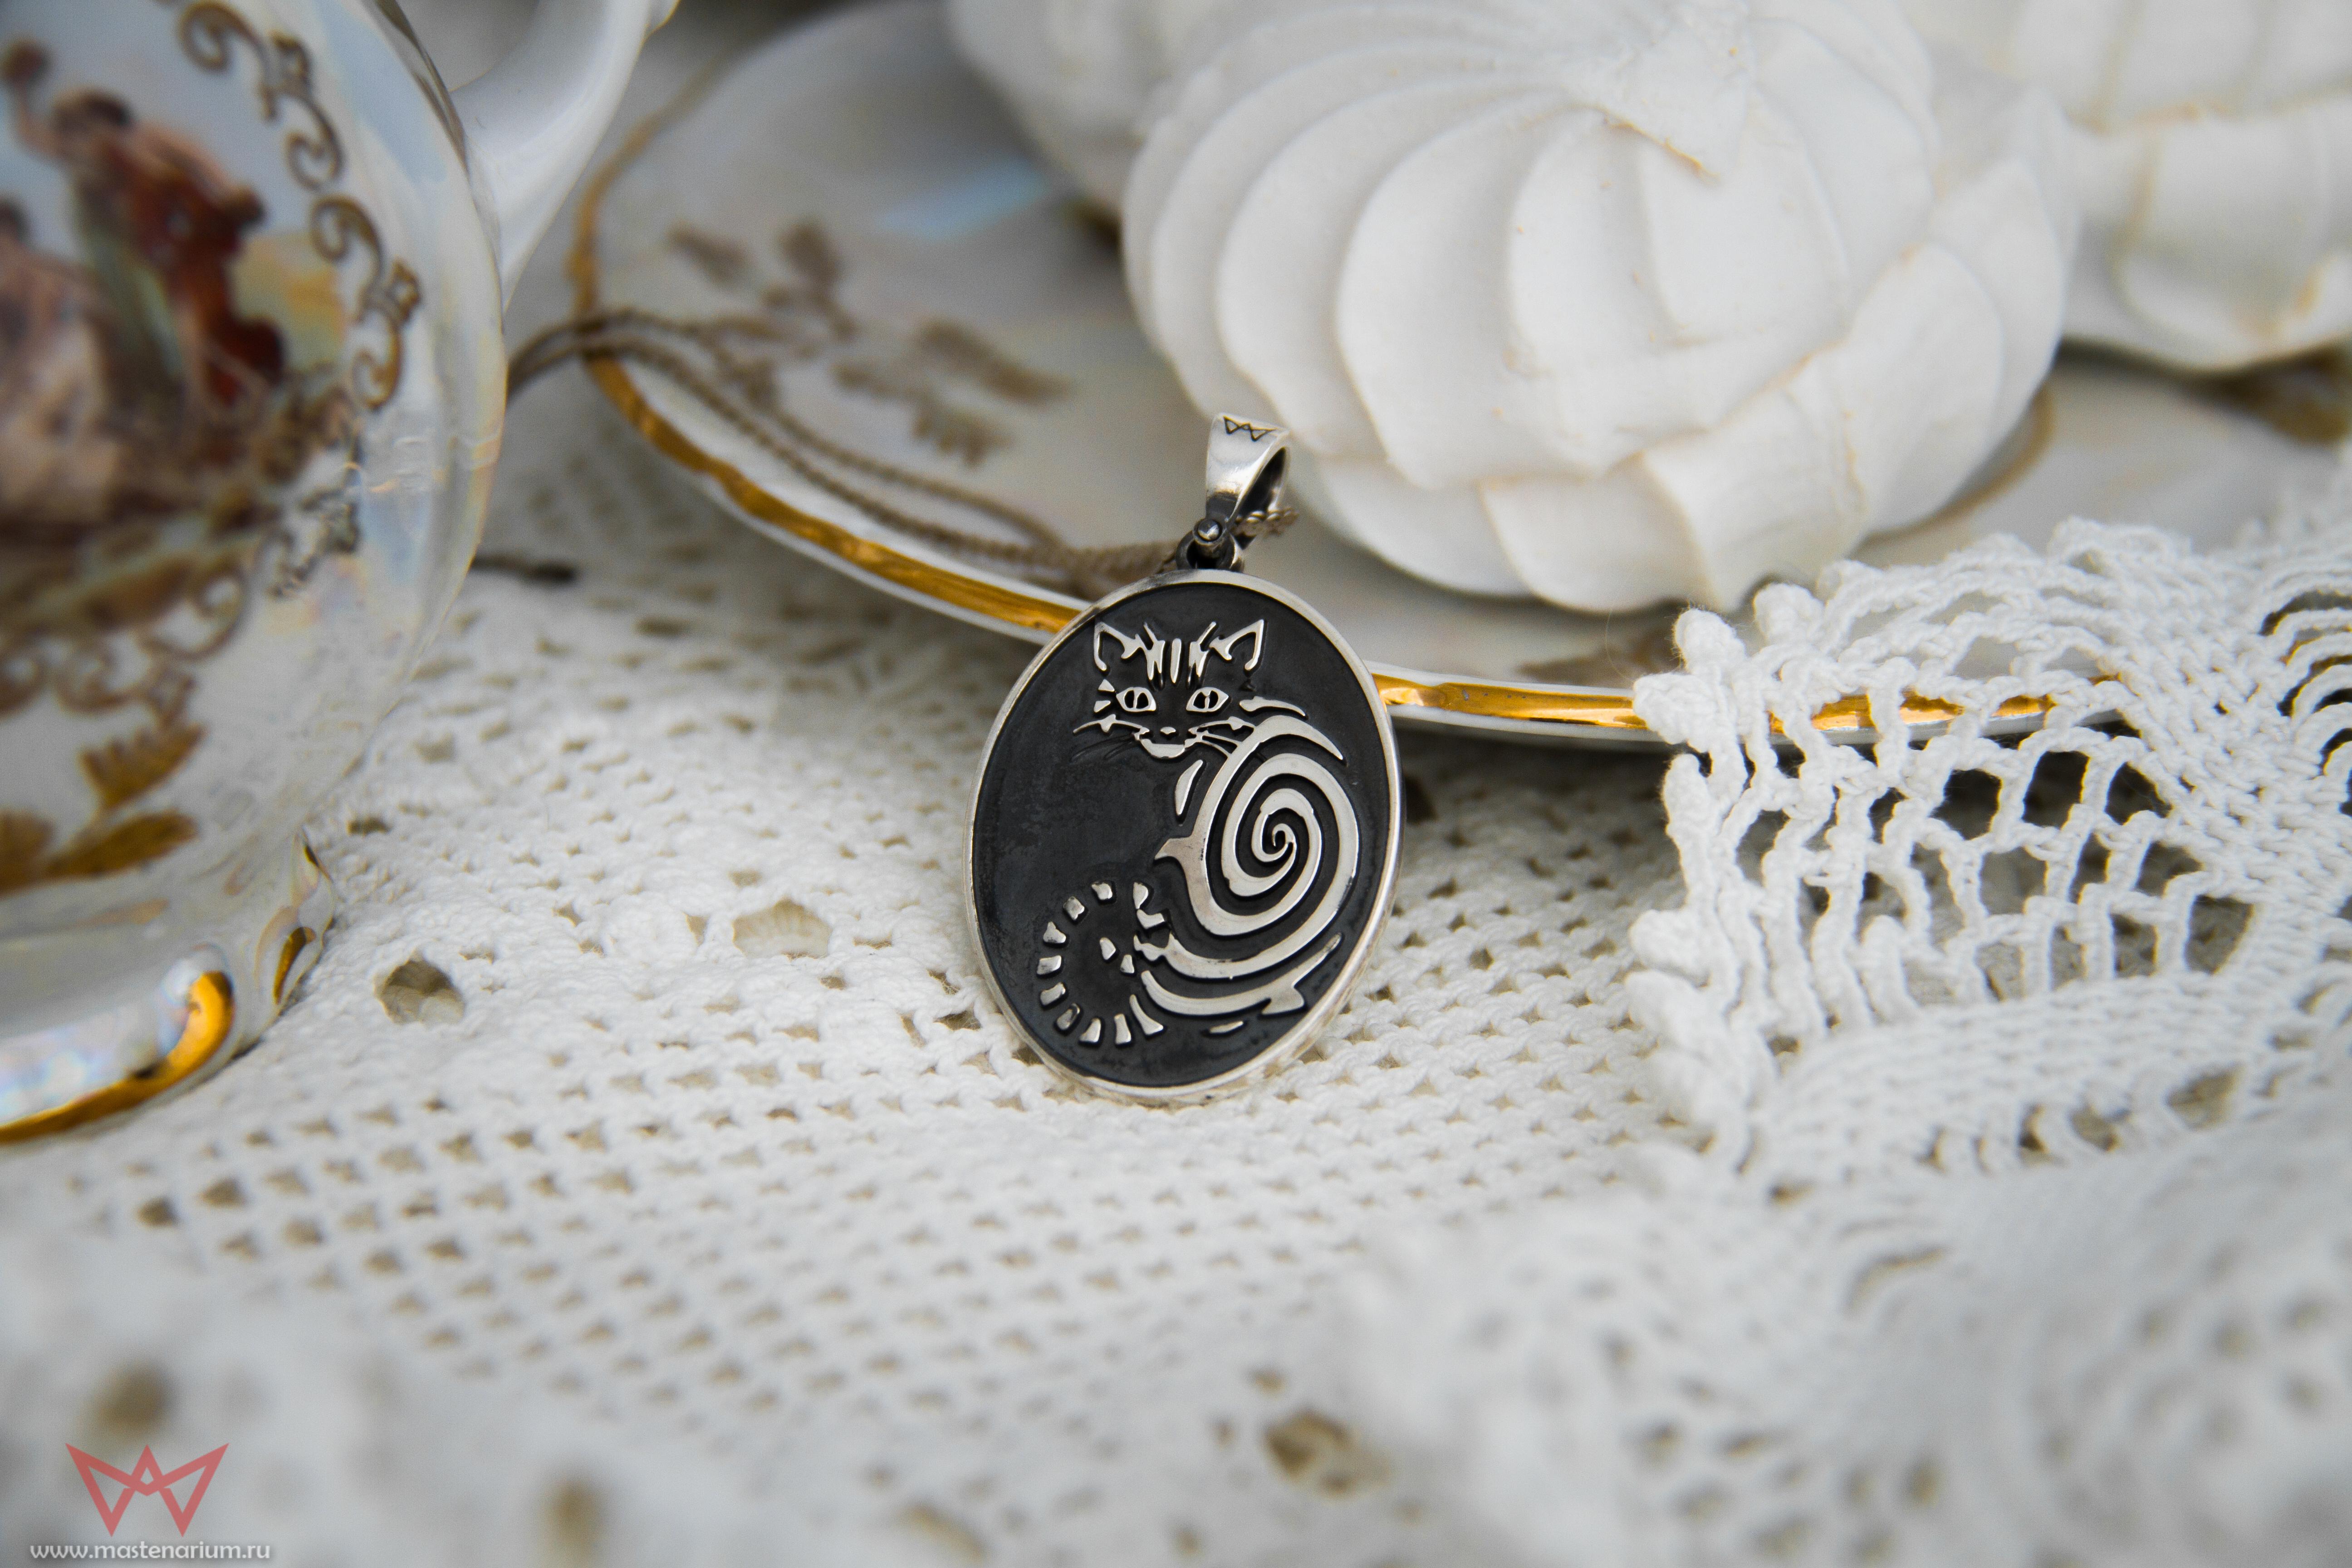 Merch Cheshire Cat Necklace Silver Alice In Wonderland